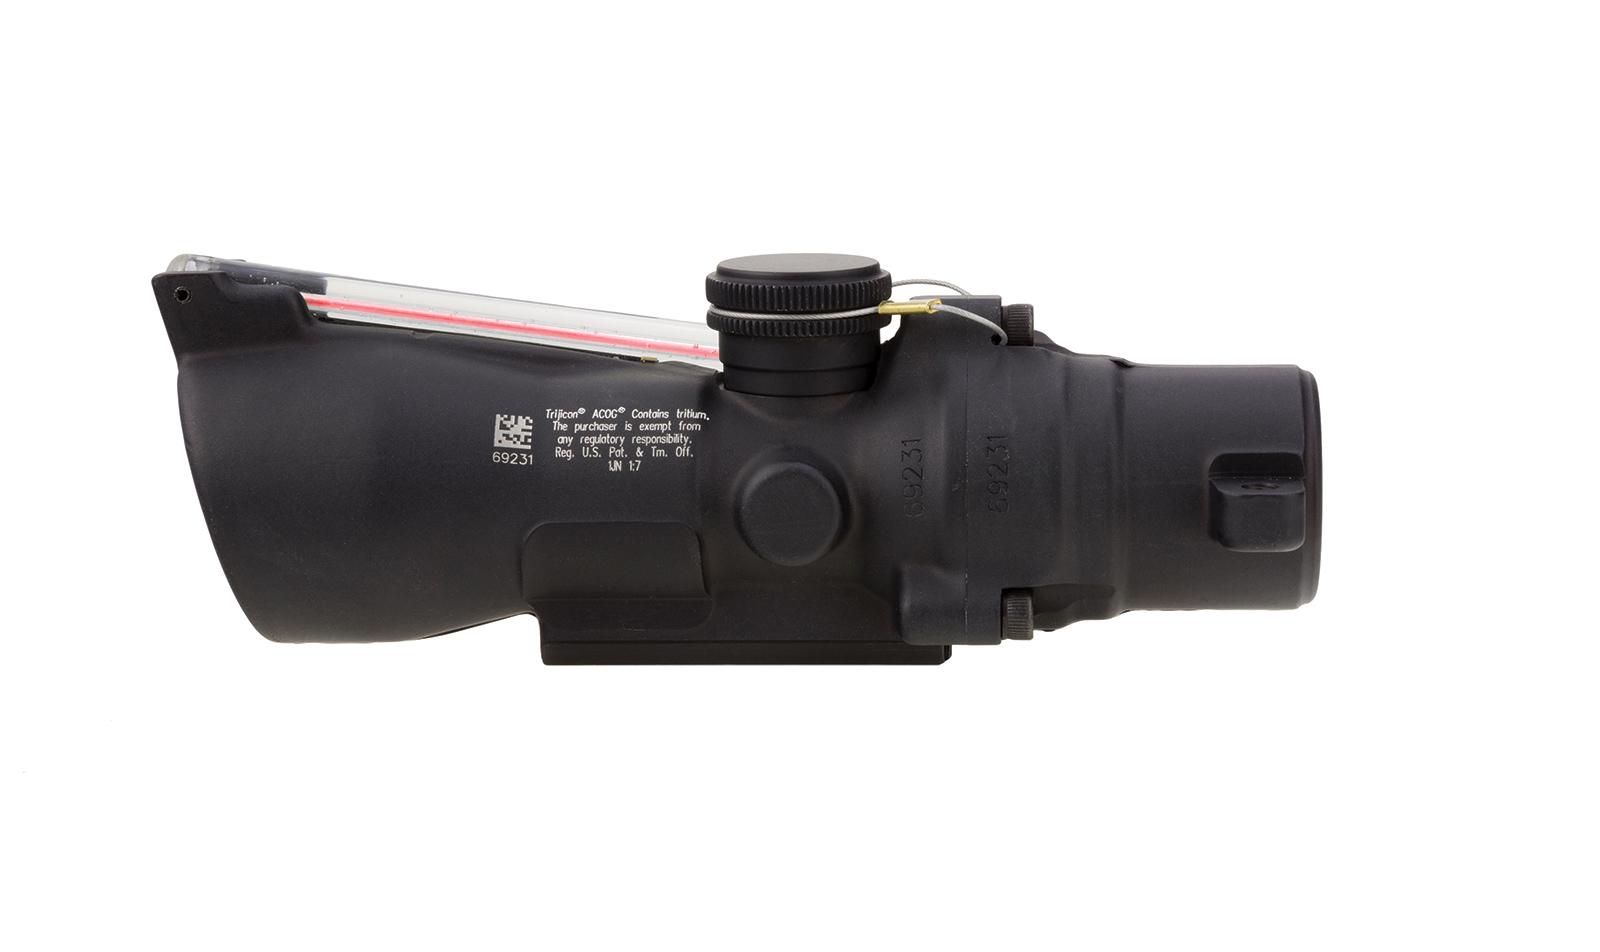 TA50-C-400235 angle 2